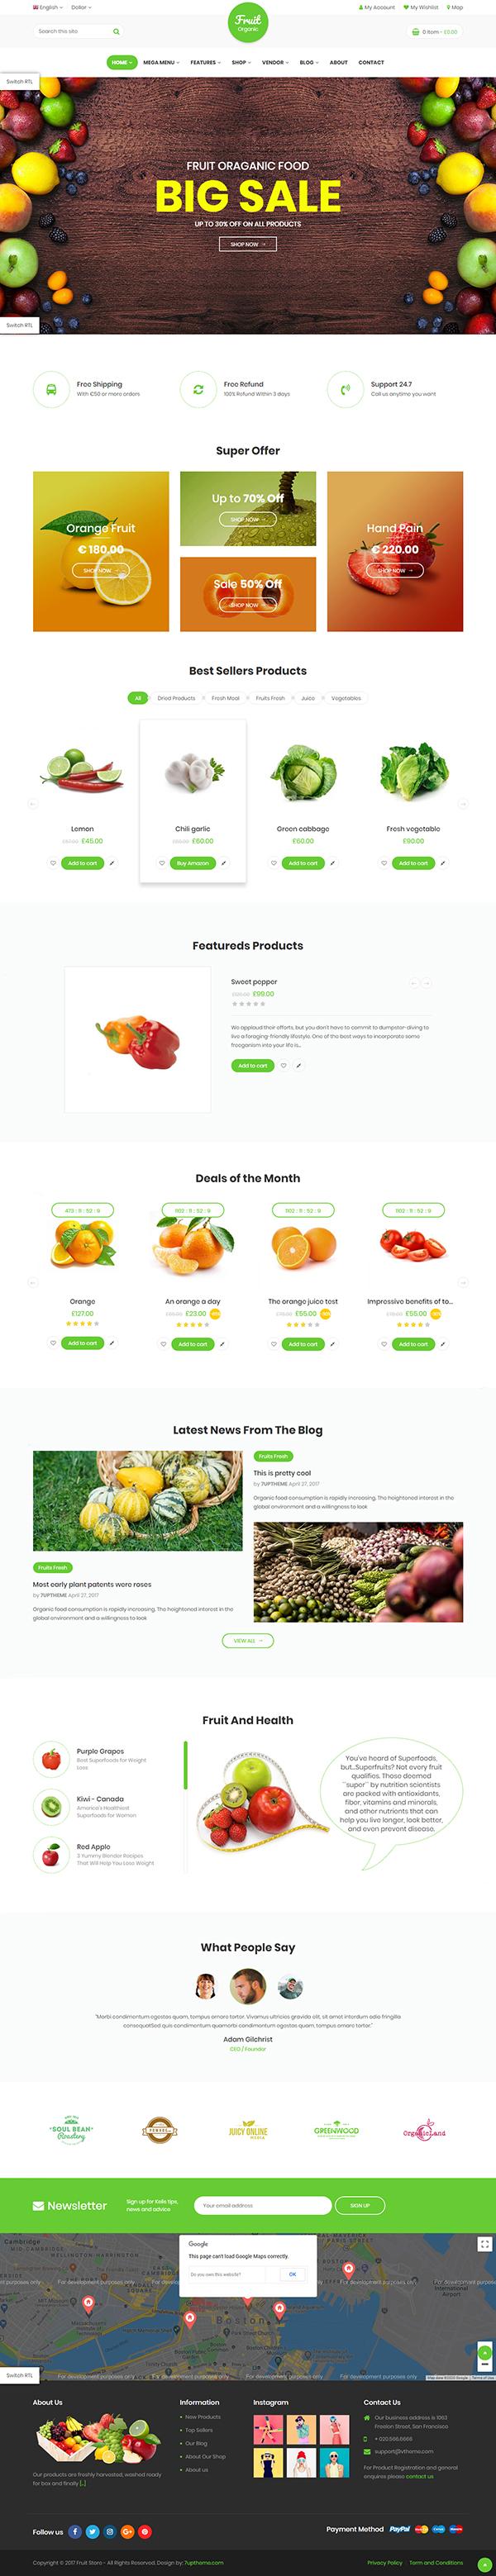 Fruit Shop - Organic Farm Food, Natural RTL Responsive WooCommerce WordPress Theme